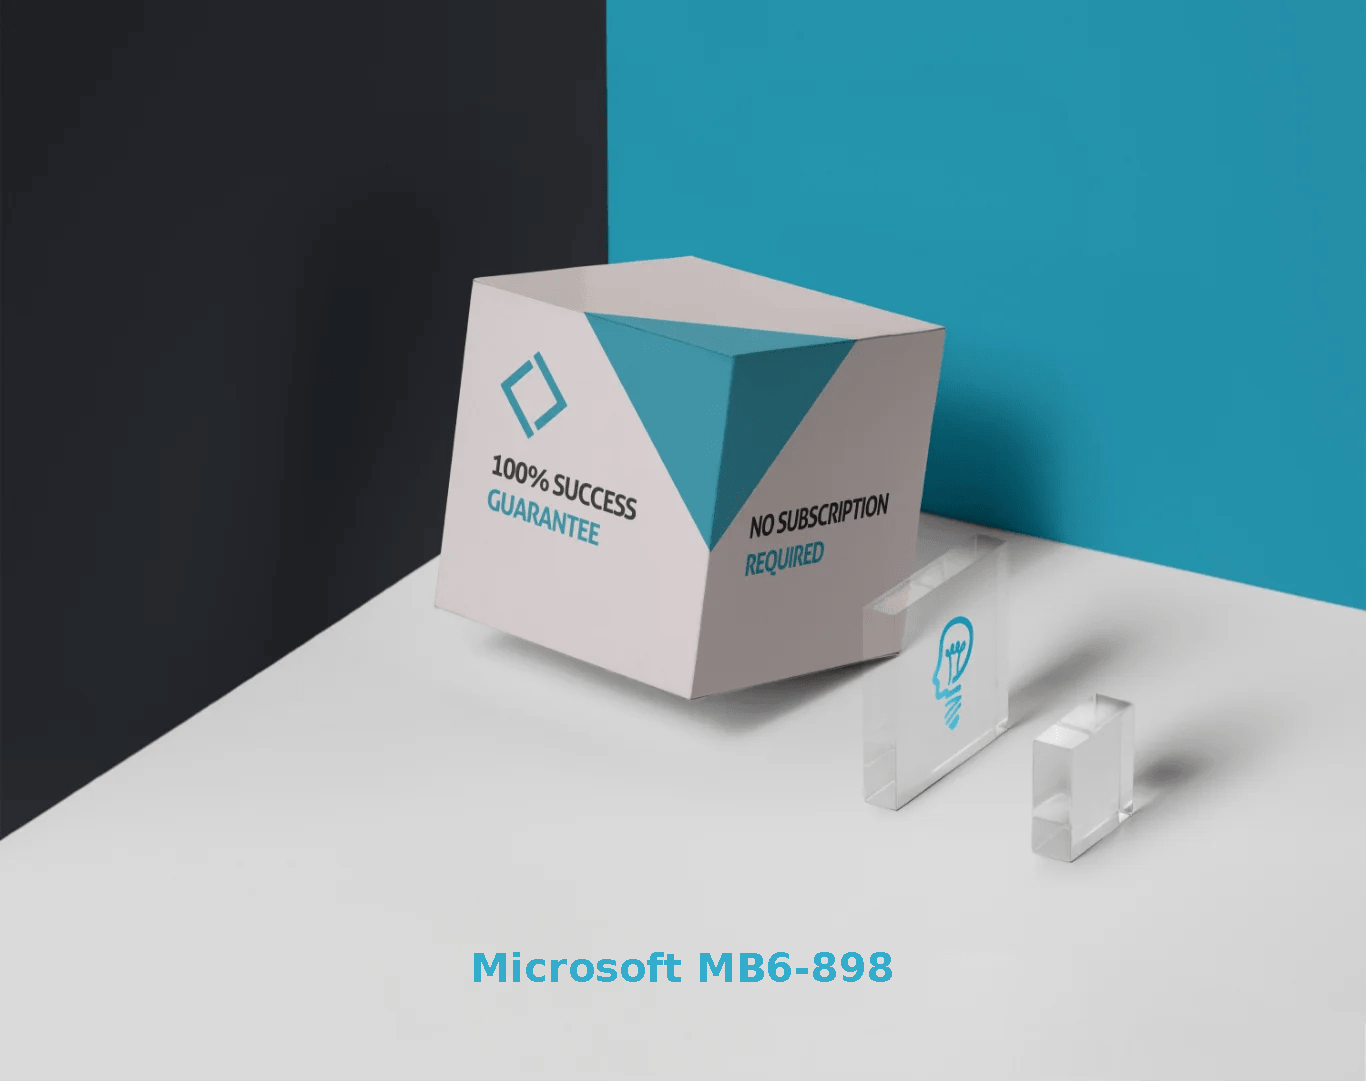 Microsoft MB6-898 Exams